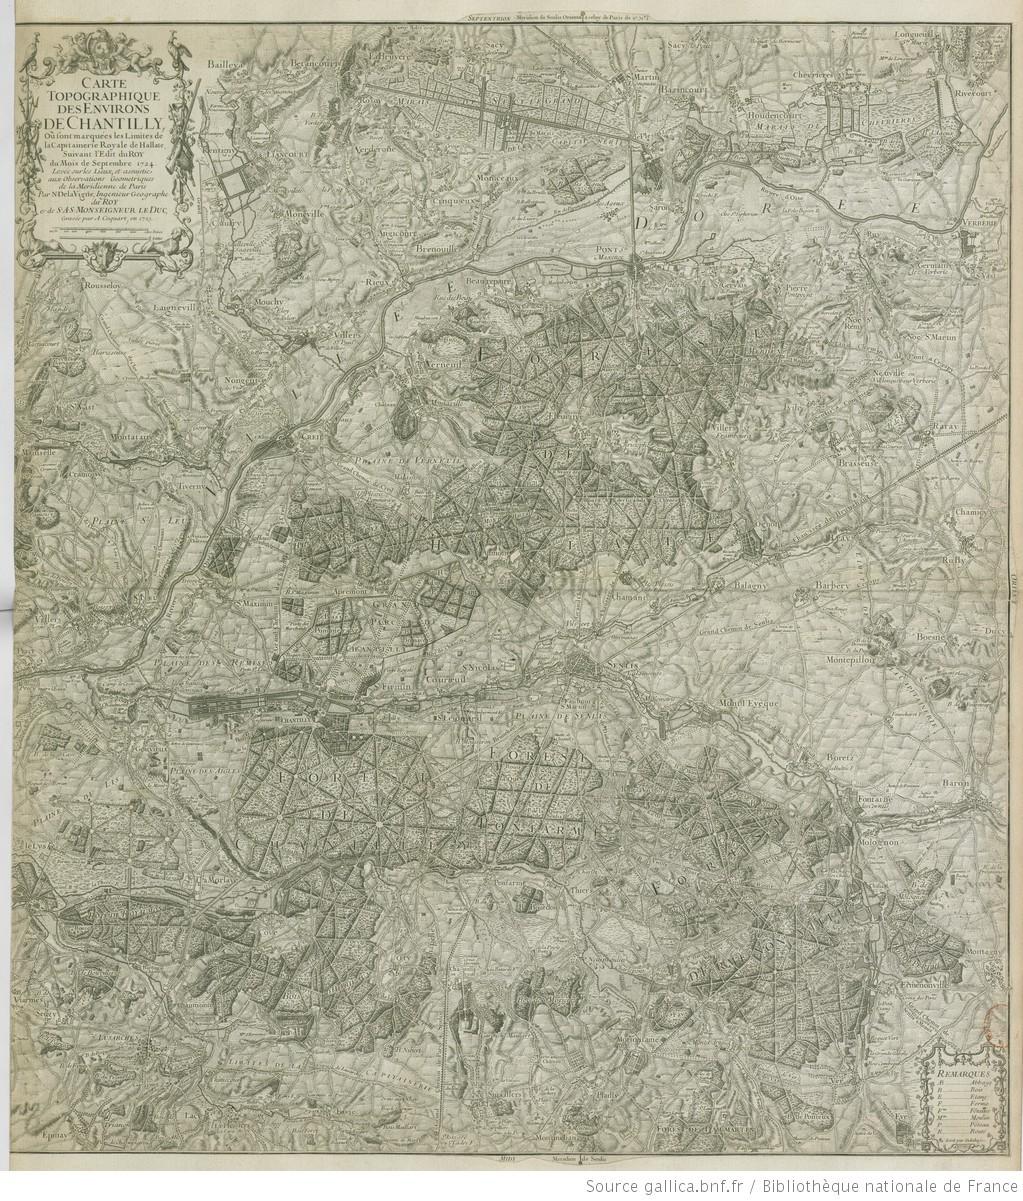 http://gallica.bnf.fr/ark:/12148/btv1b5971800n.thumbnail.highres.jpg